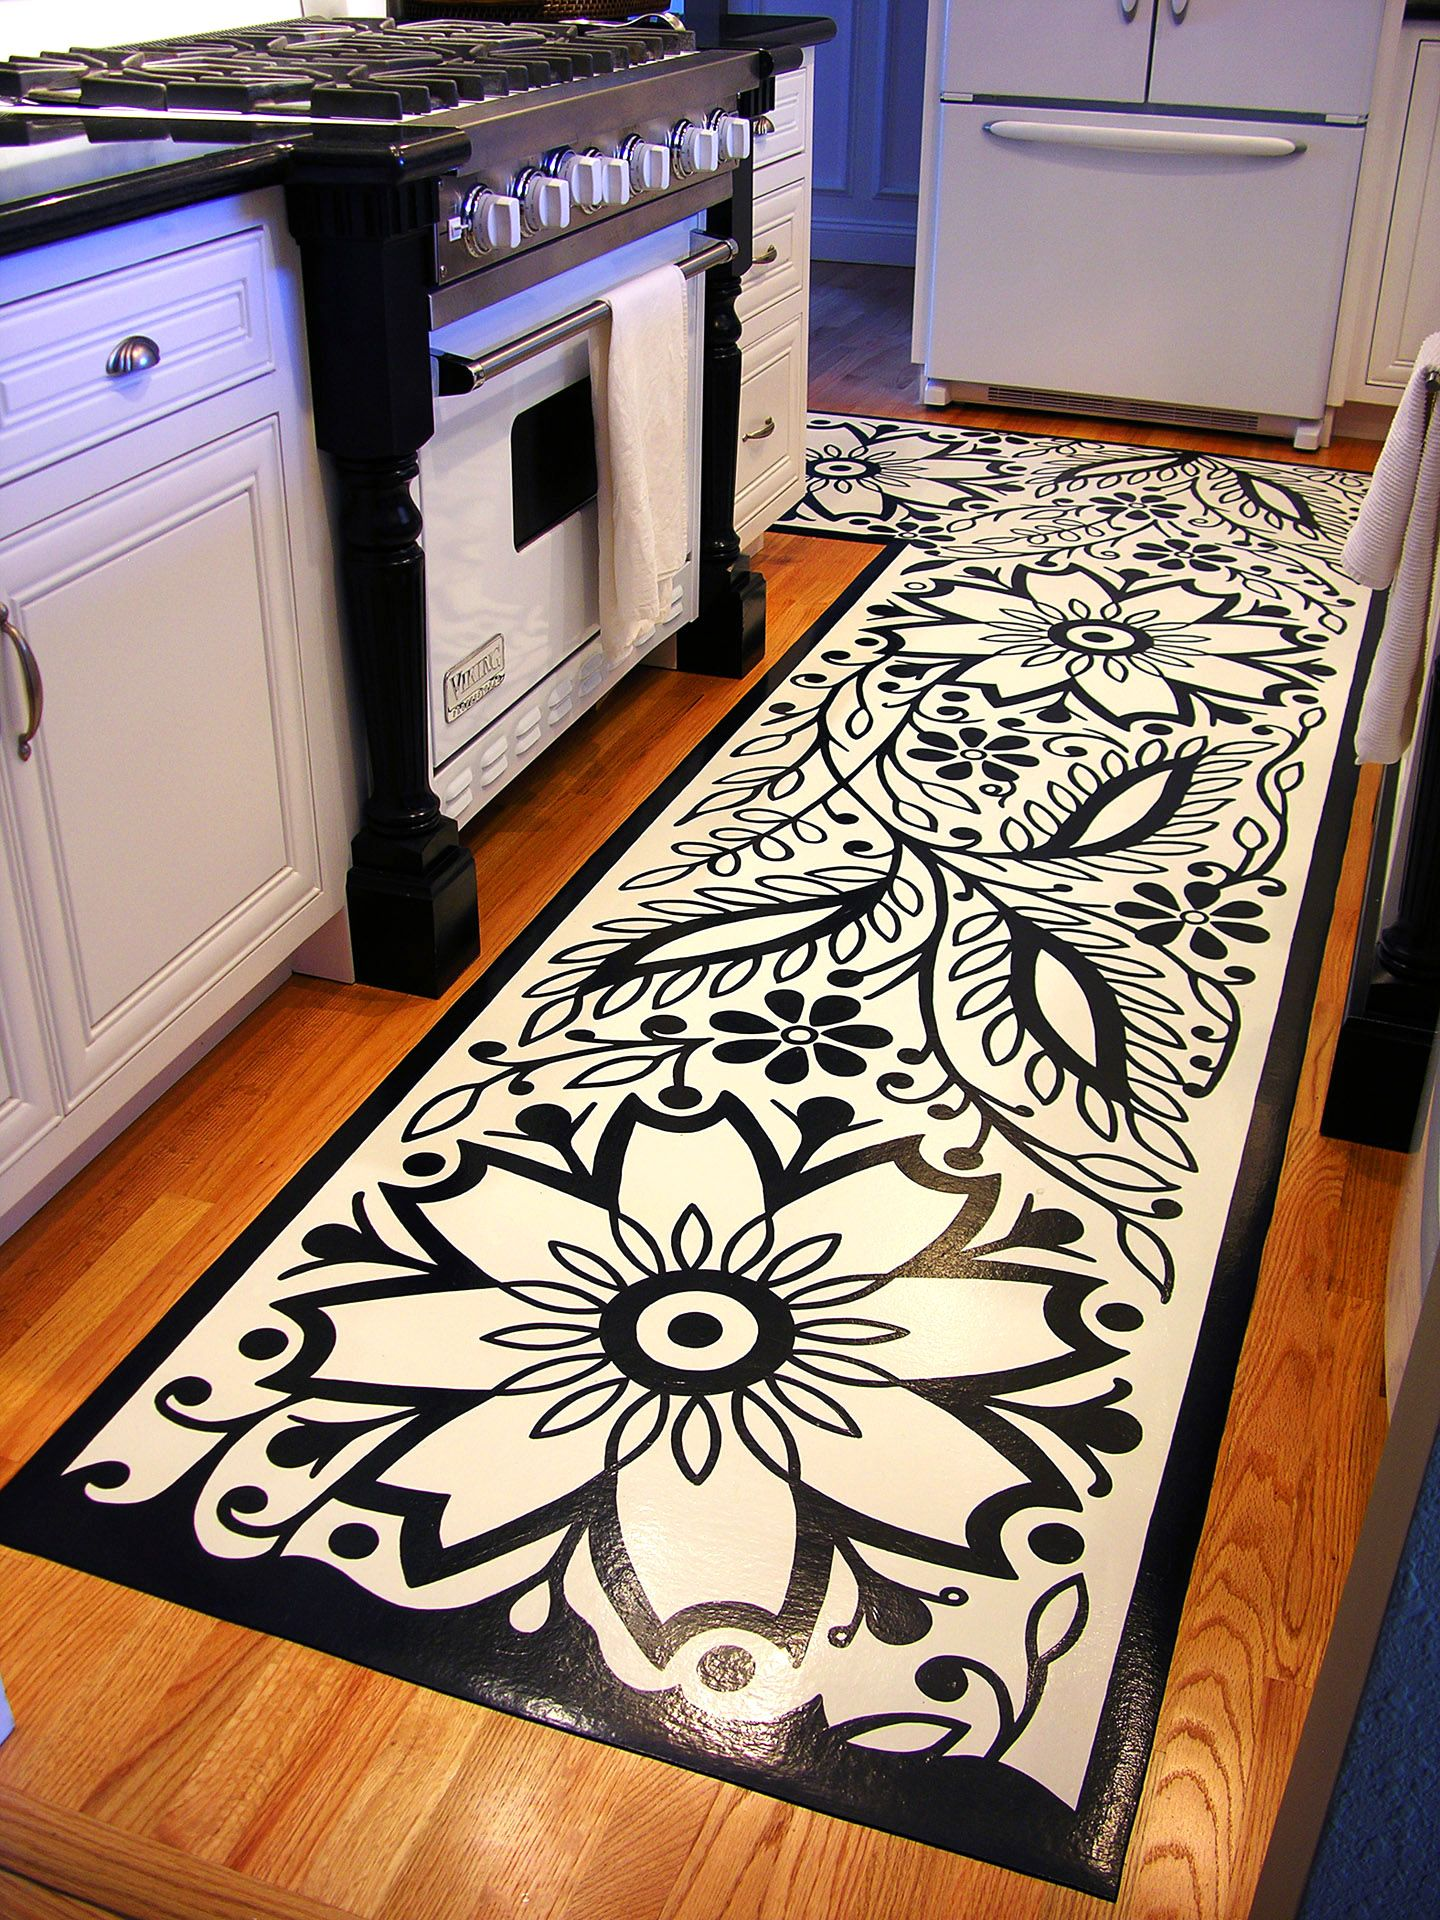 Graphic black and white kitchen mat design pinterest Kitchen floor mats designer